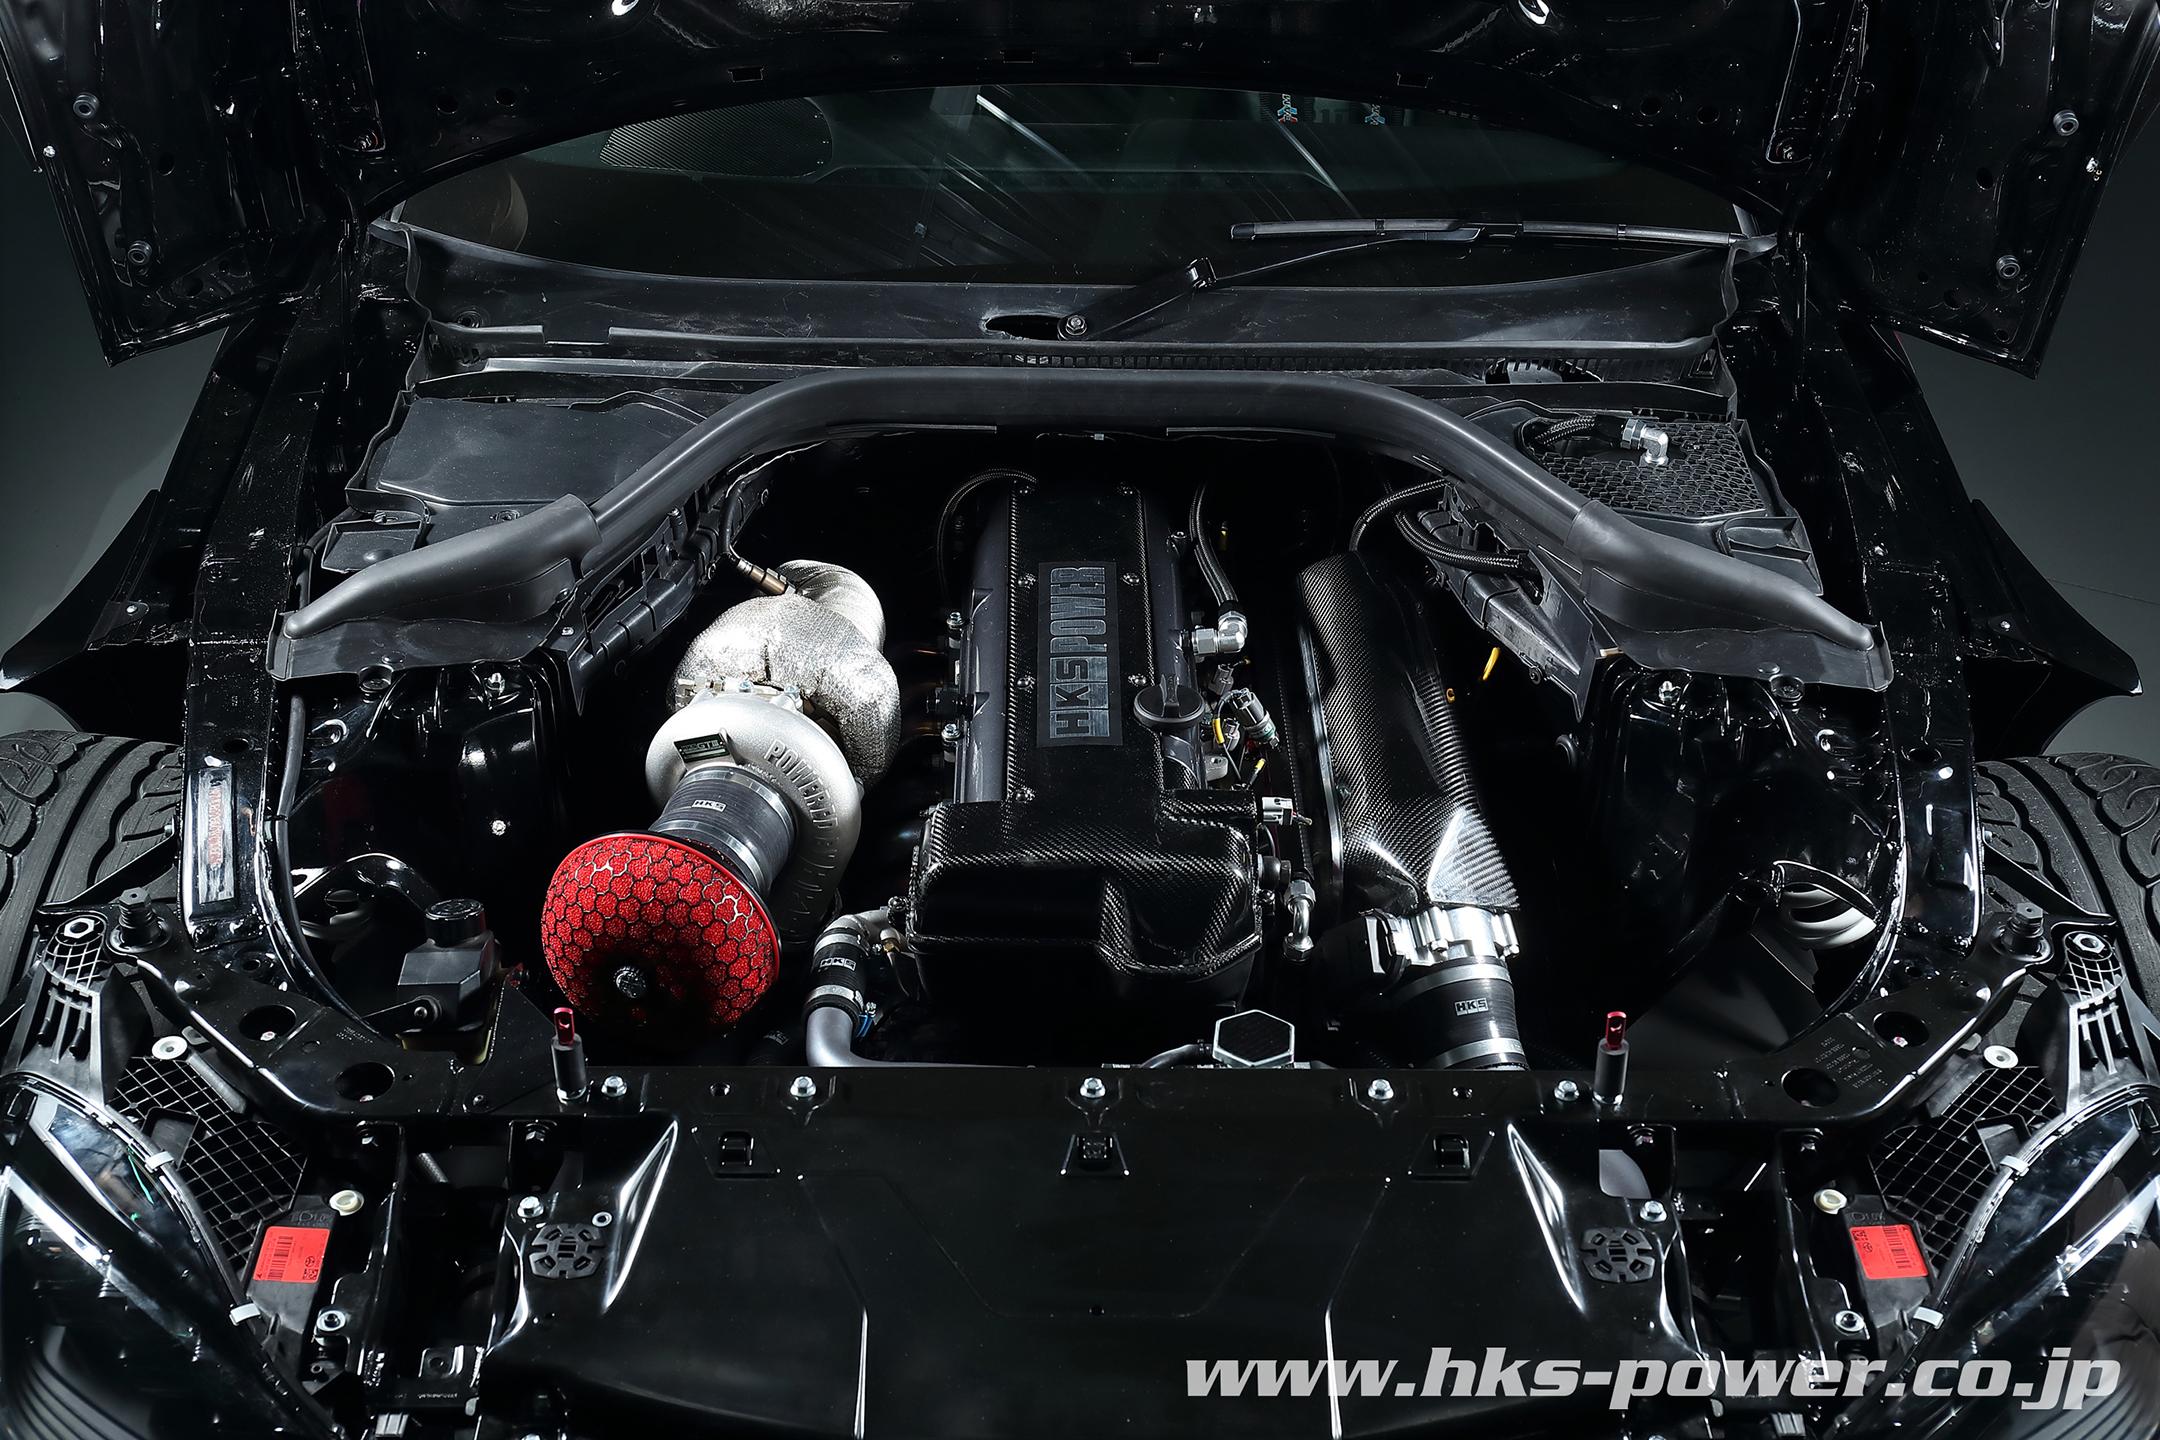 HKS Toyota GR Supra Drift - 2019 - under the hood - engine / moteur - 2JZ-GTE - Turbo